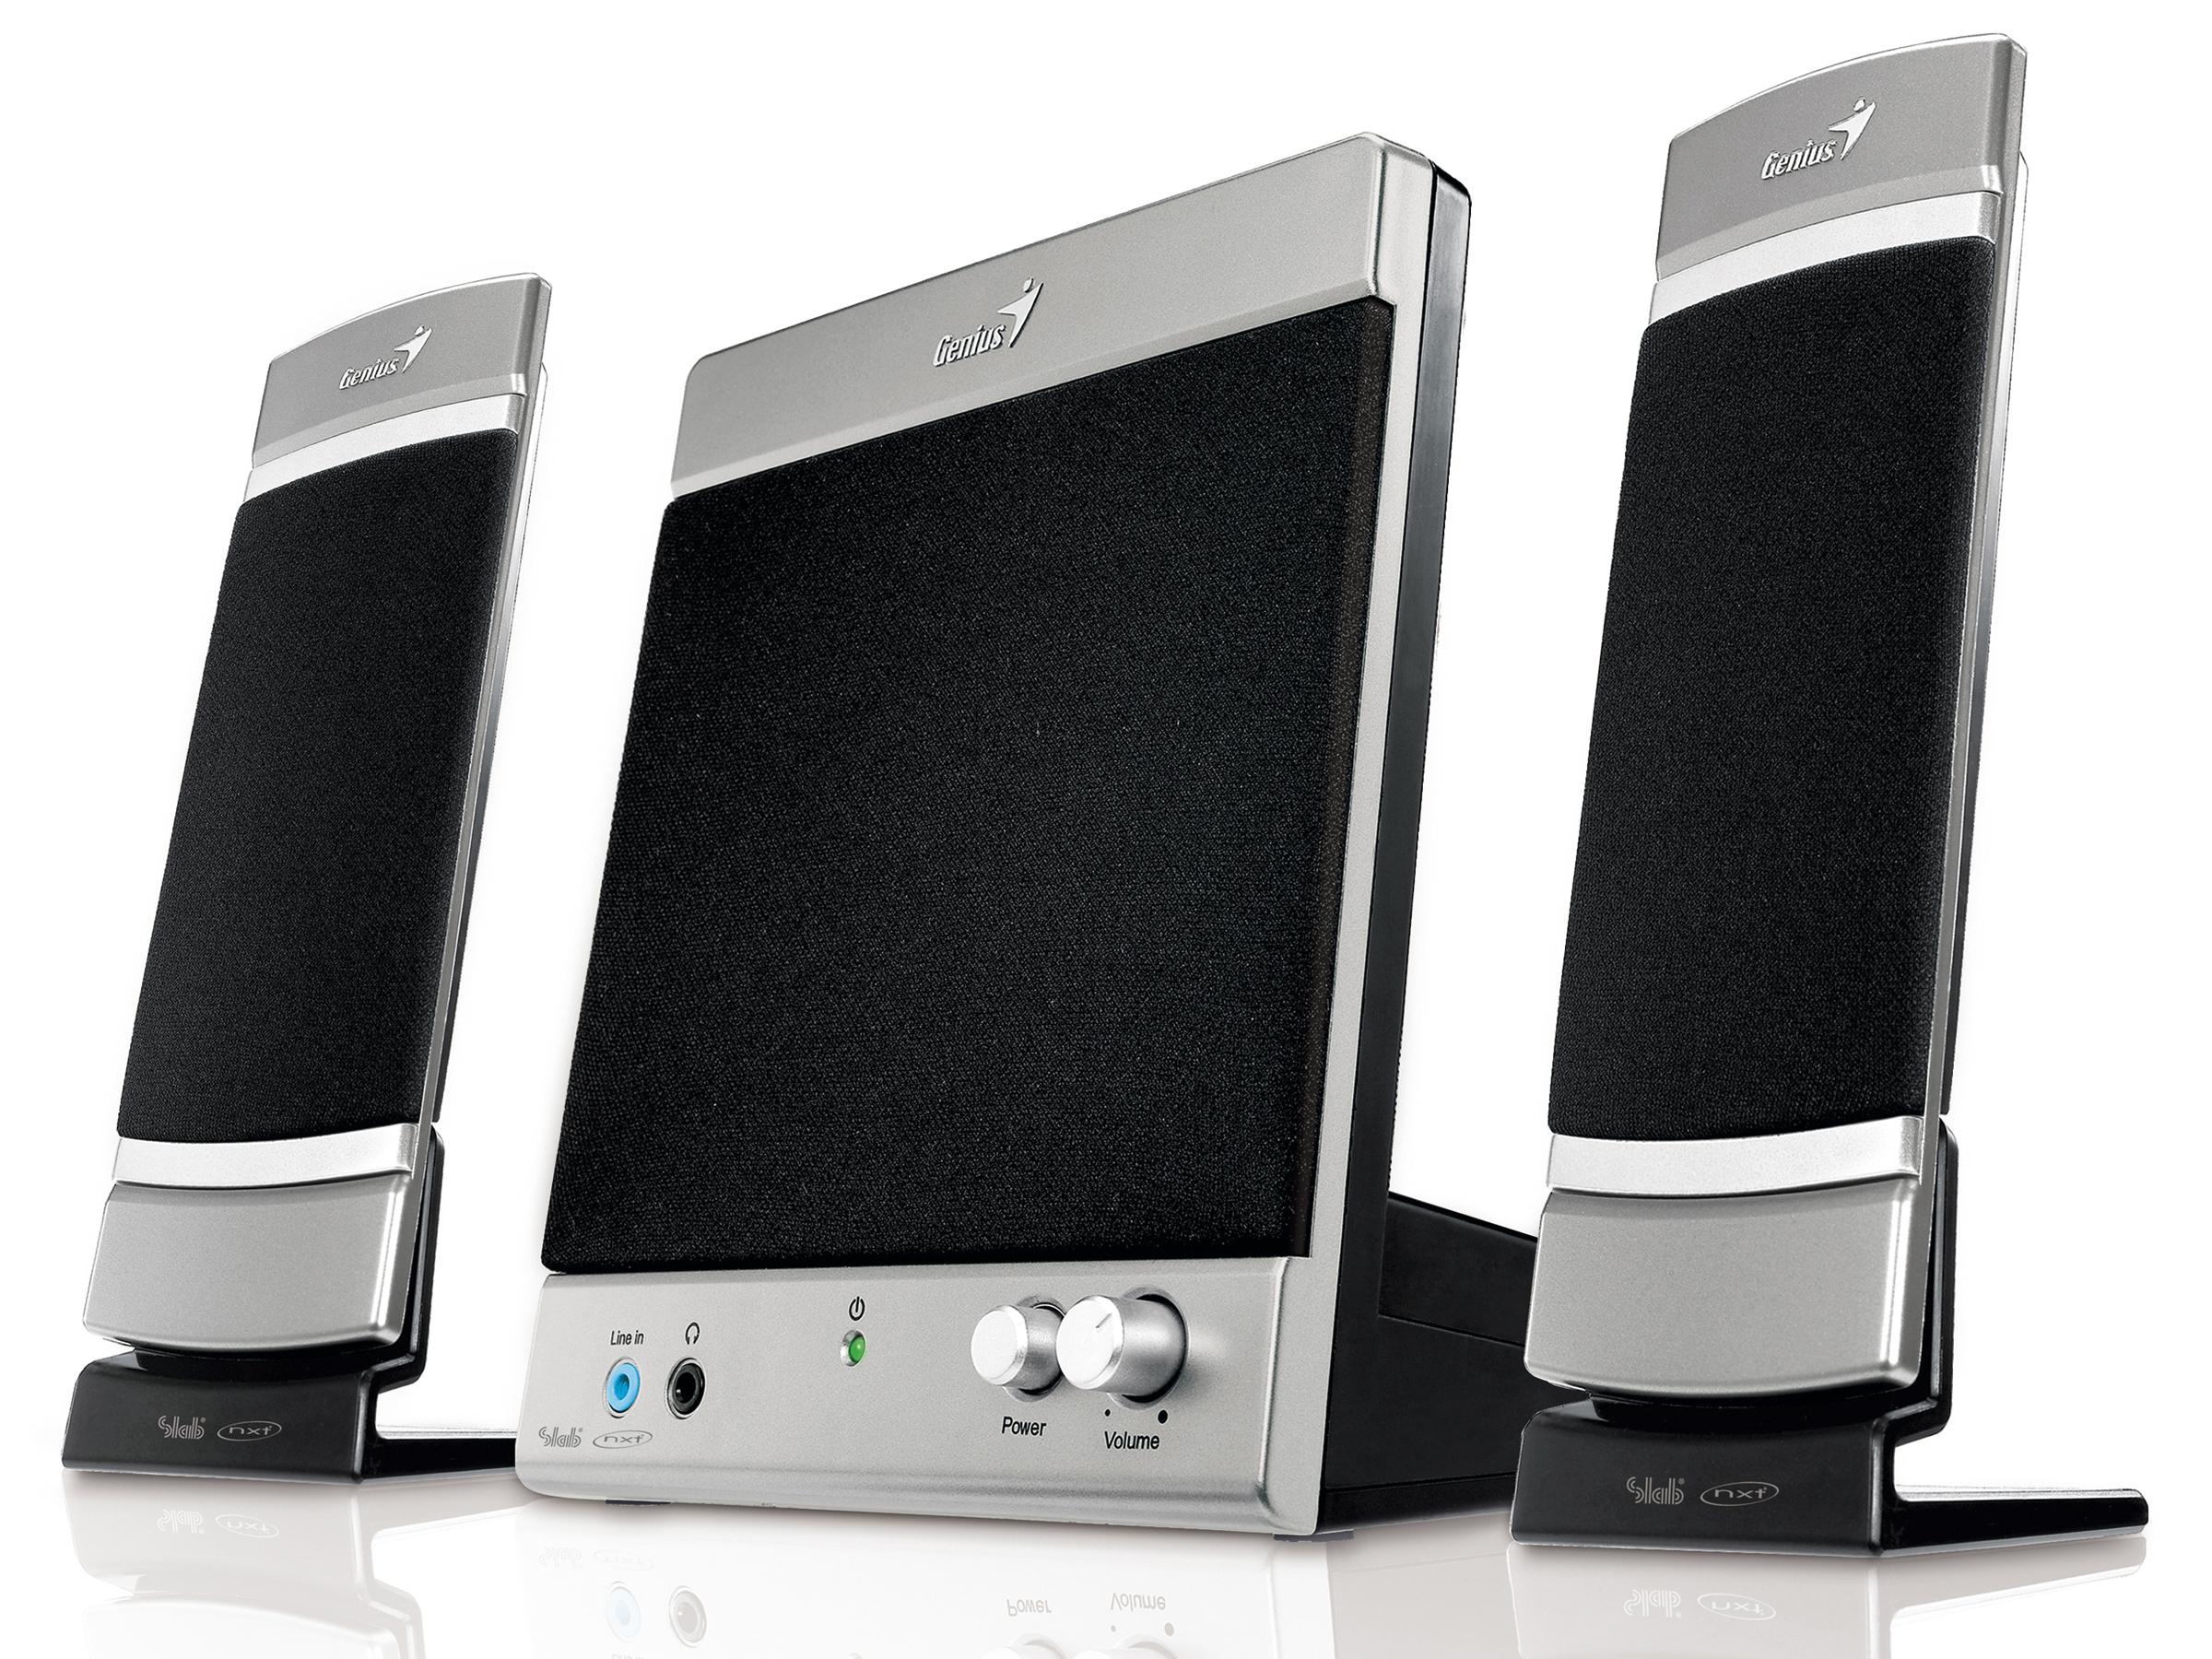 Genius Sw Flat 21 700 Techradar Hi Fi Pc Speaker System